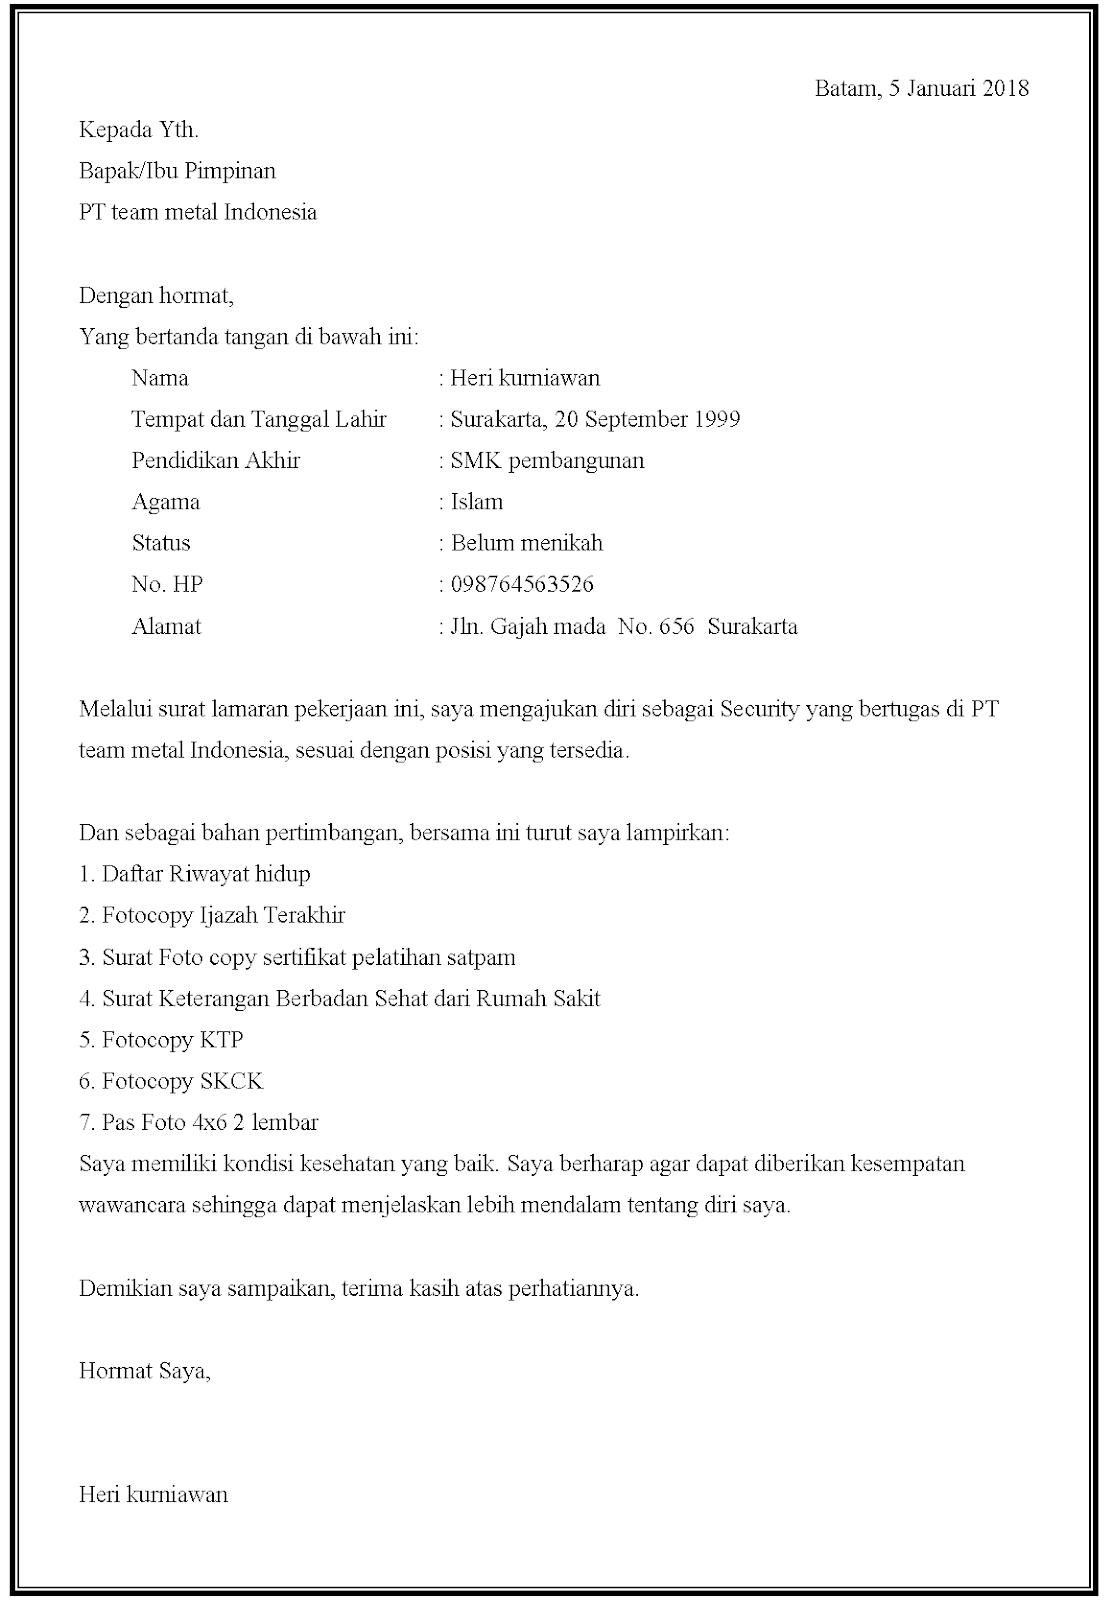 Cara Melamar Di Pt Iss : melamar, Contoh, Surat, Lamaran, Kerja, Indonesia